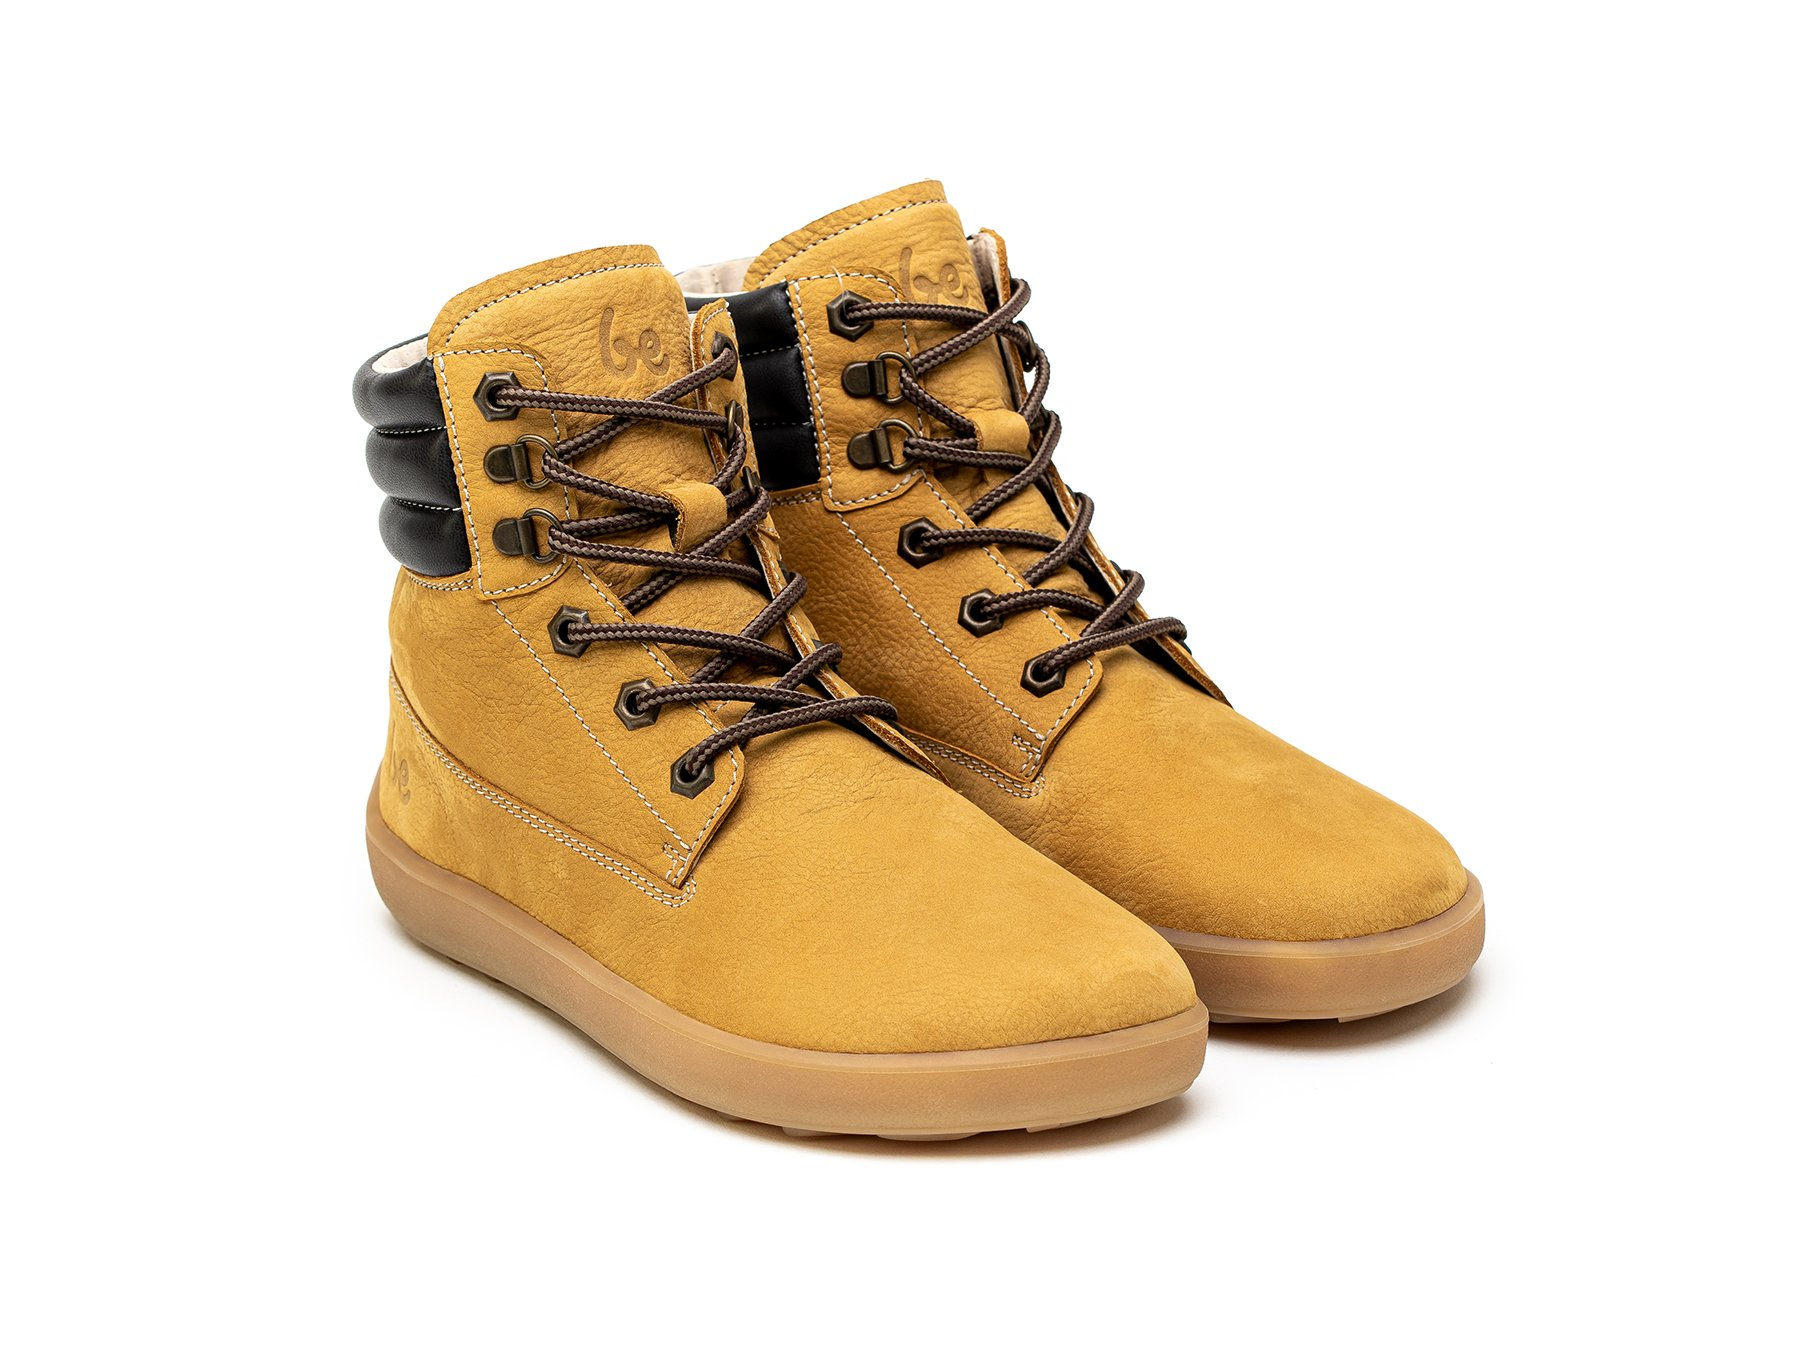 BeLenka Nevada Boots Mustard